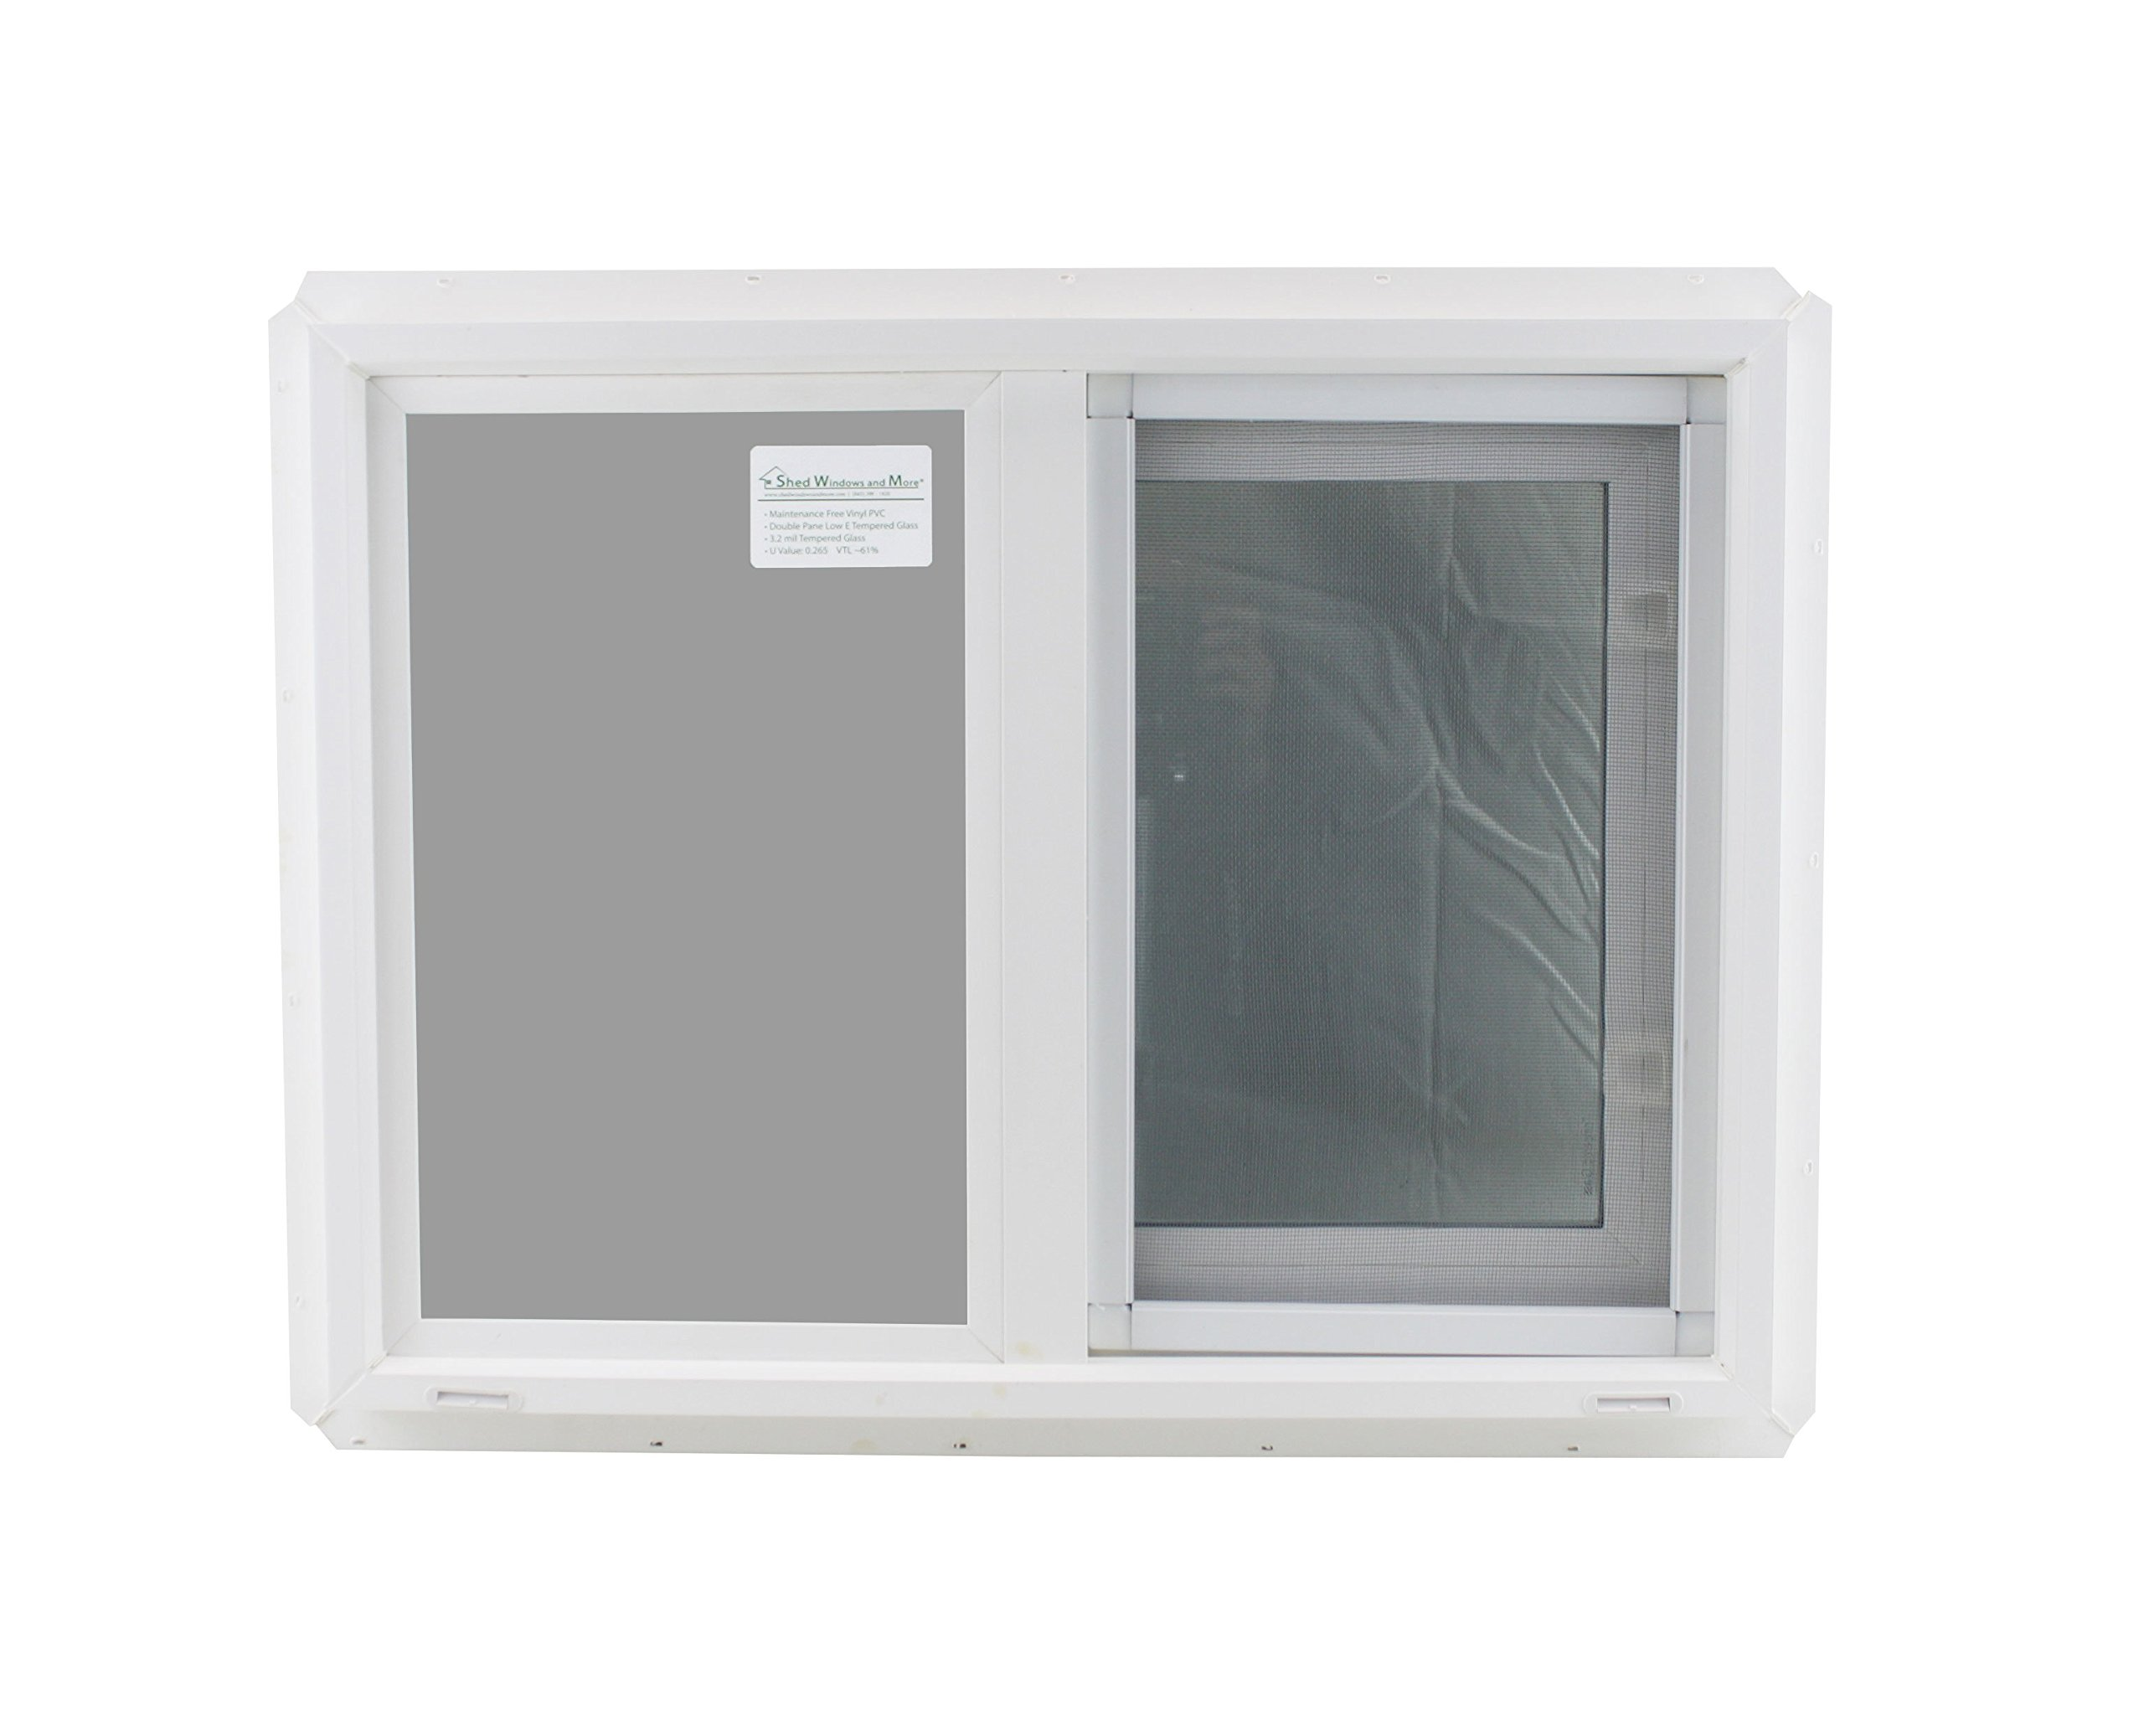 Window 24'' x 18'' Double Pane Tempered Glass Low-E PVC Frame Horizontal Slider